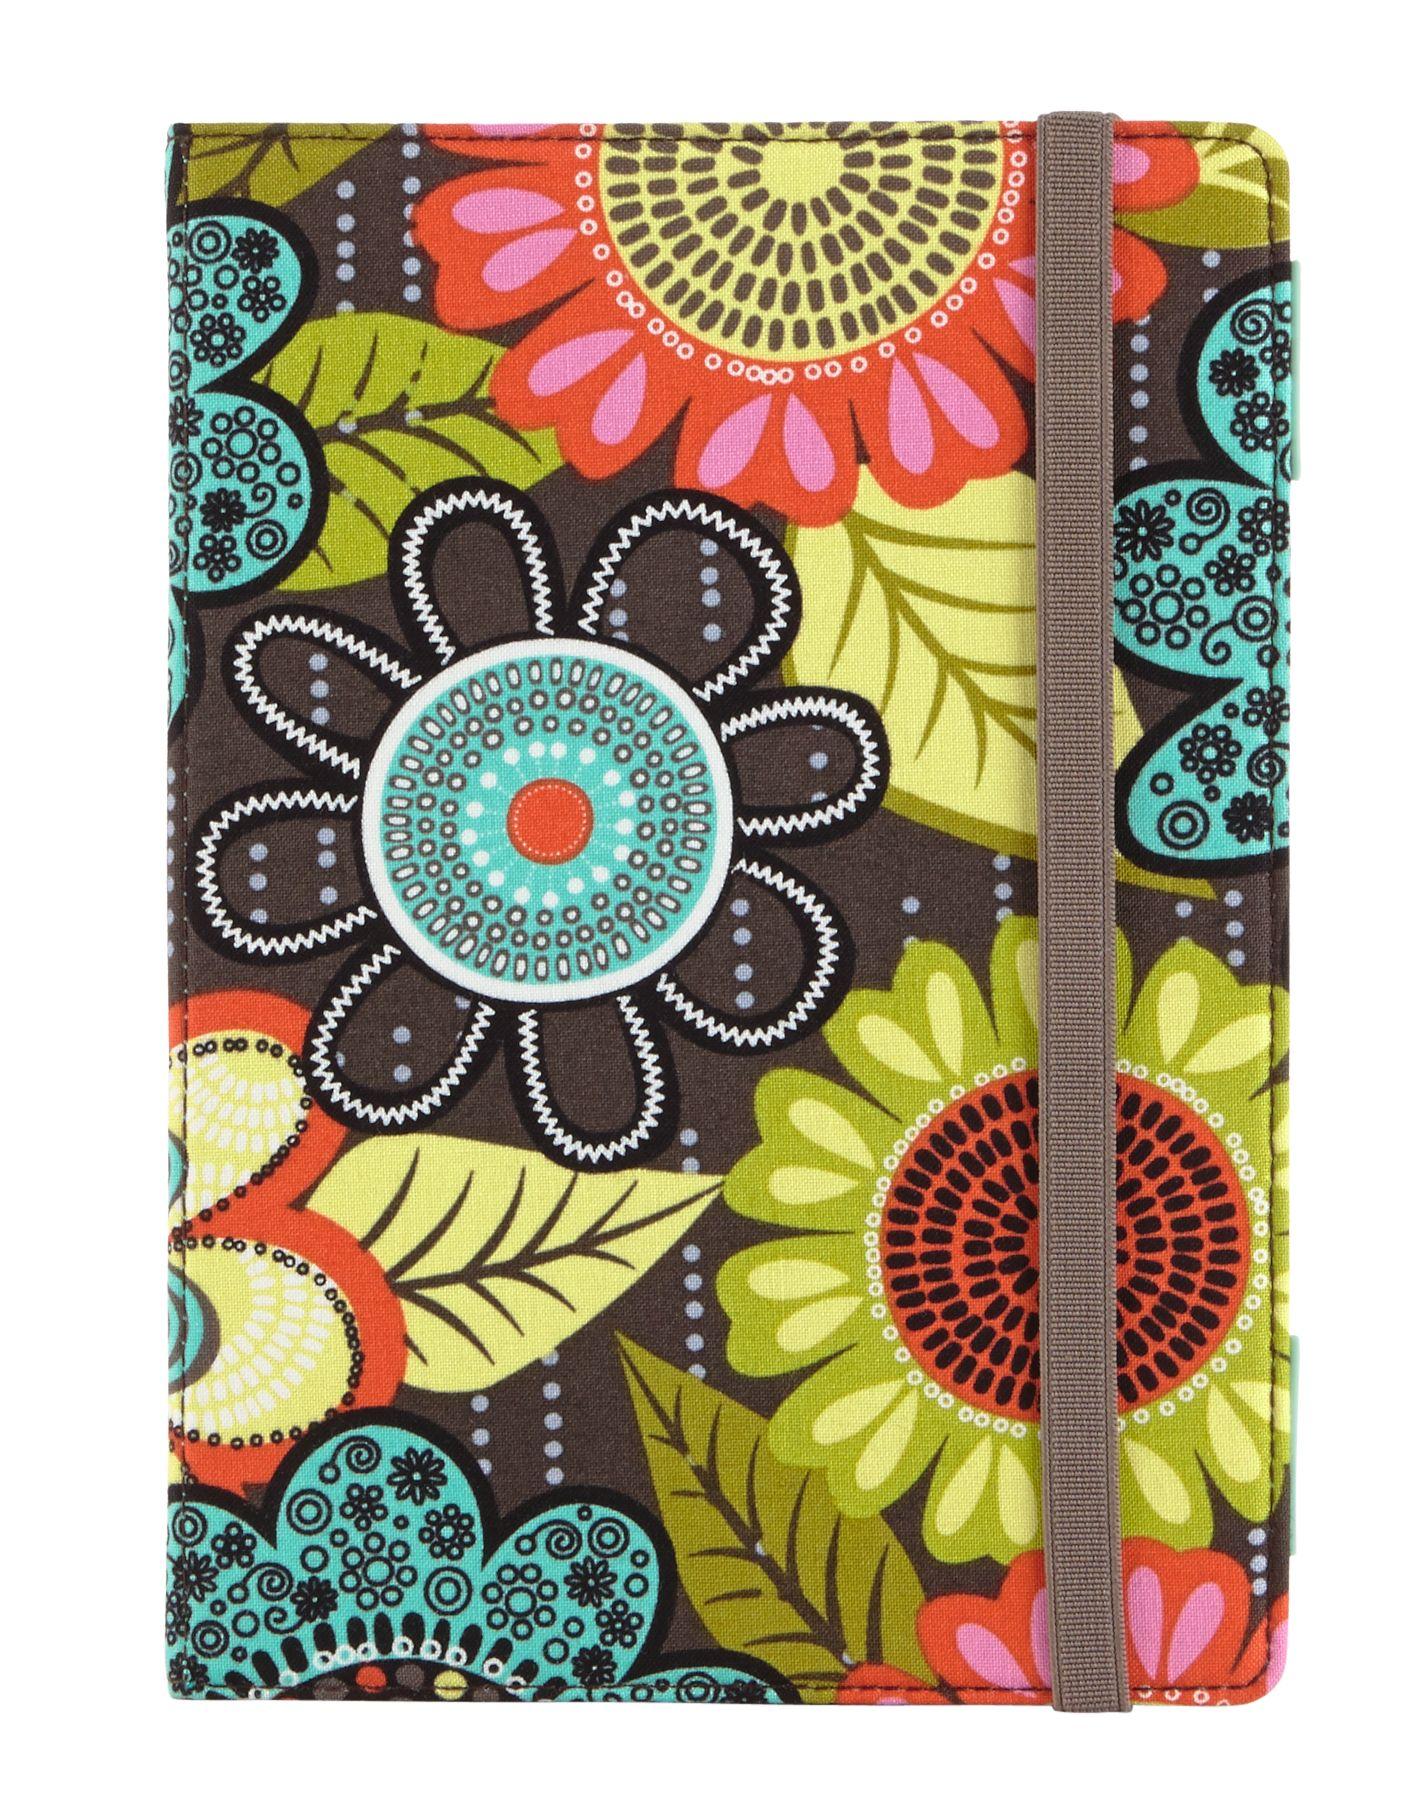 Vera Bradley Medium Tablet Cover in Flower Shower